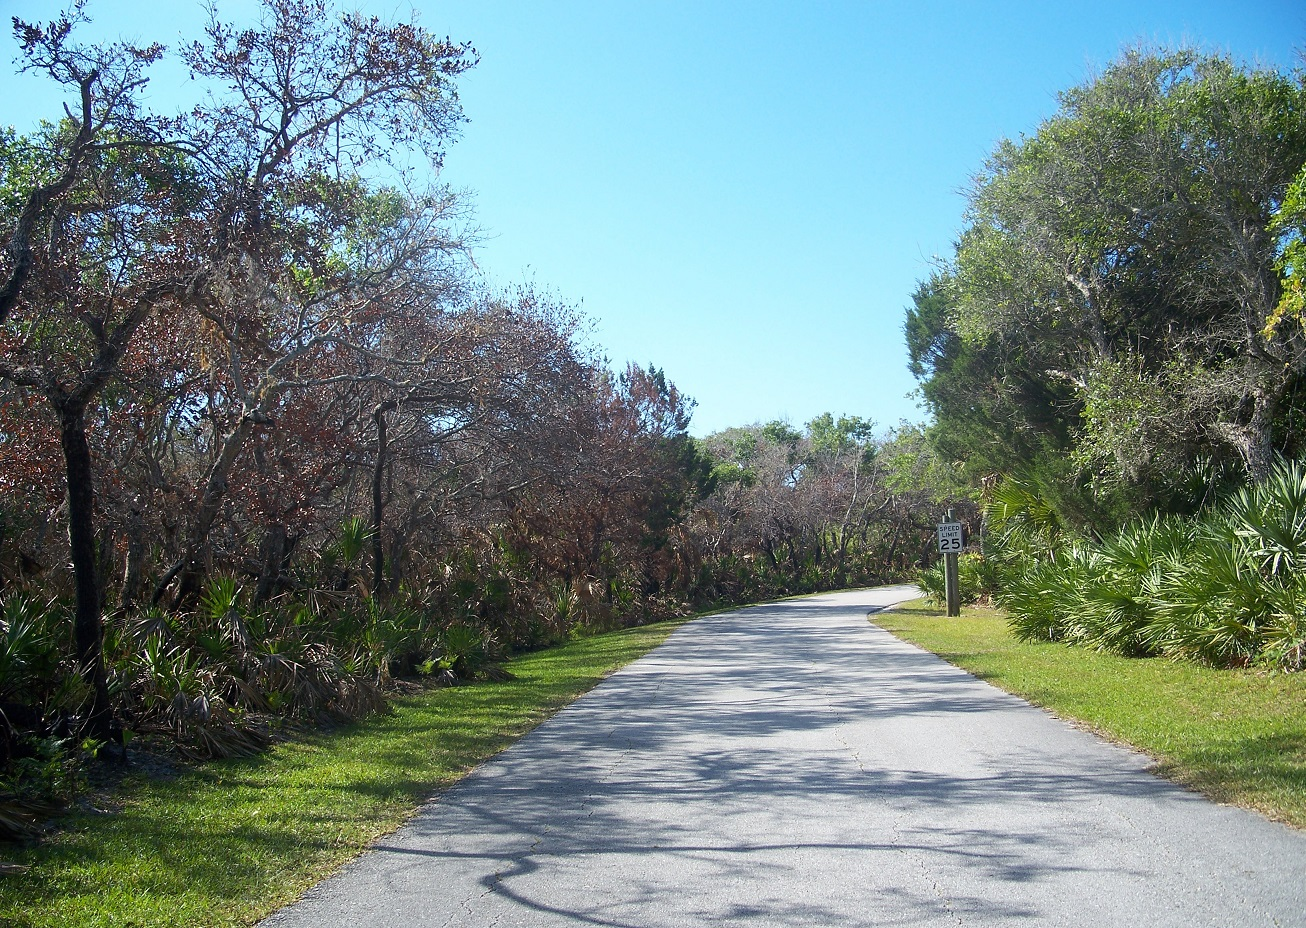 Homes For Sale In Apollo Beach Fl: Tampa Suburbs Real Estate Trends